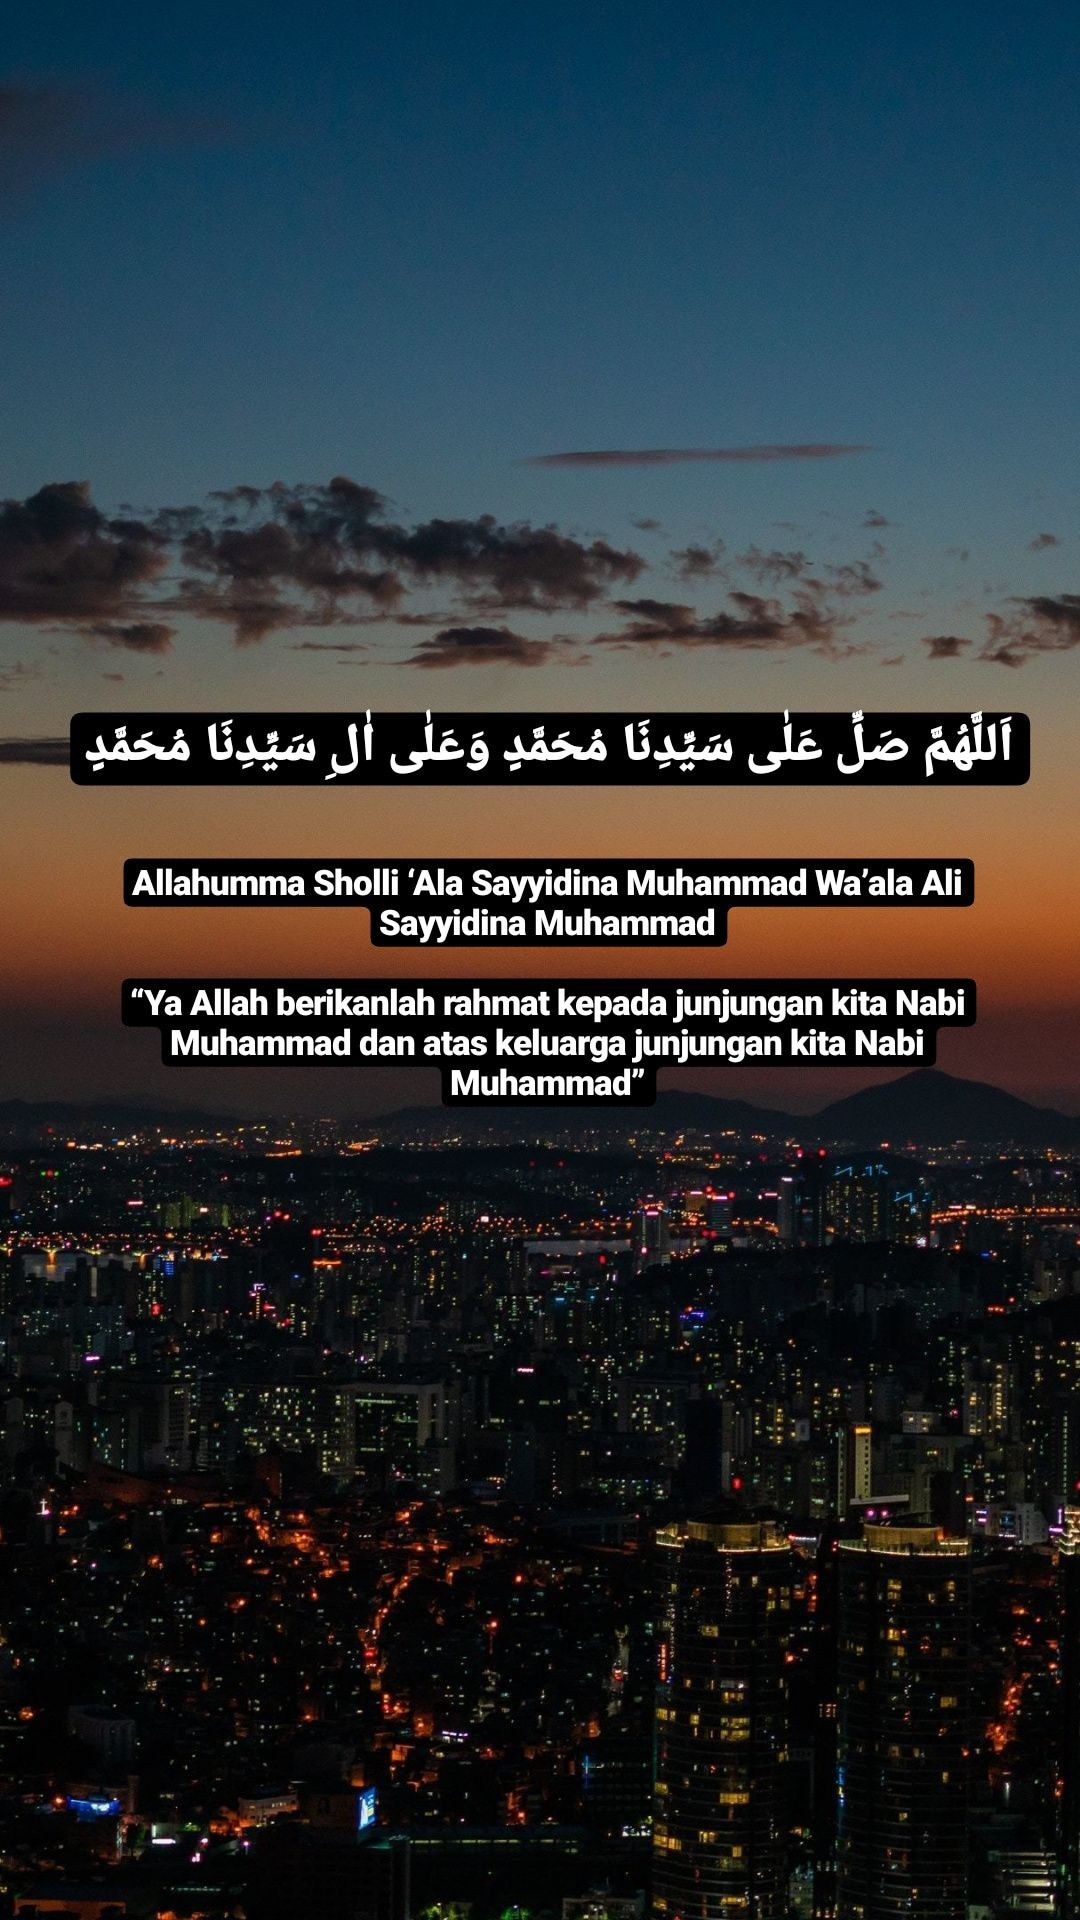 Tulisan Arab Allahumma Sholli Ala Sayyidina Muhammad : tulisan, allahumma, sholli, sayyidina, muhammad